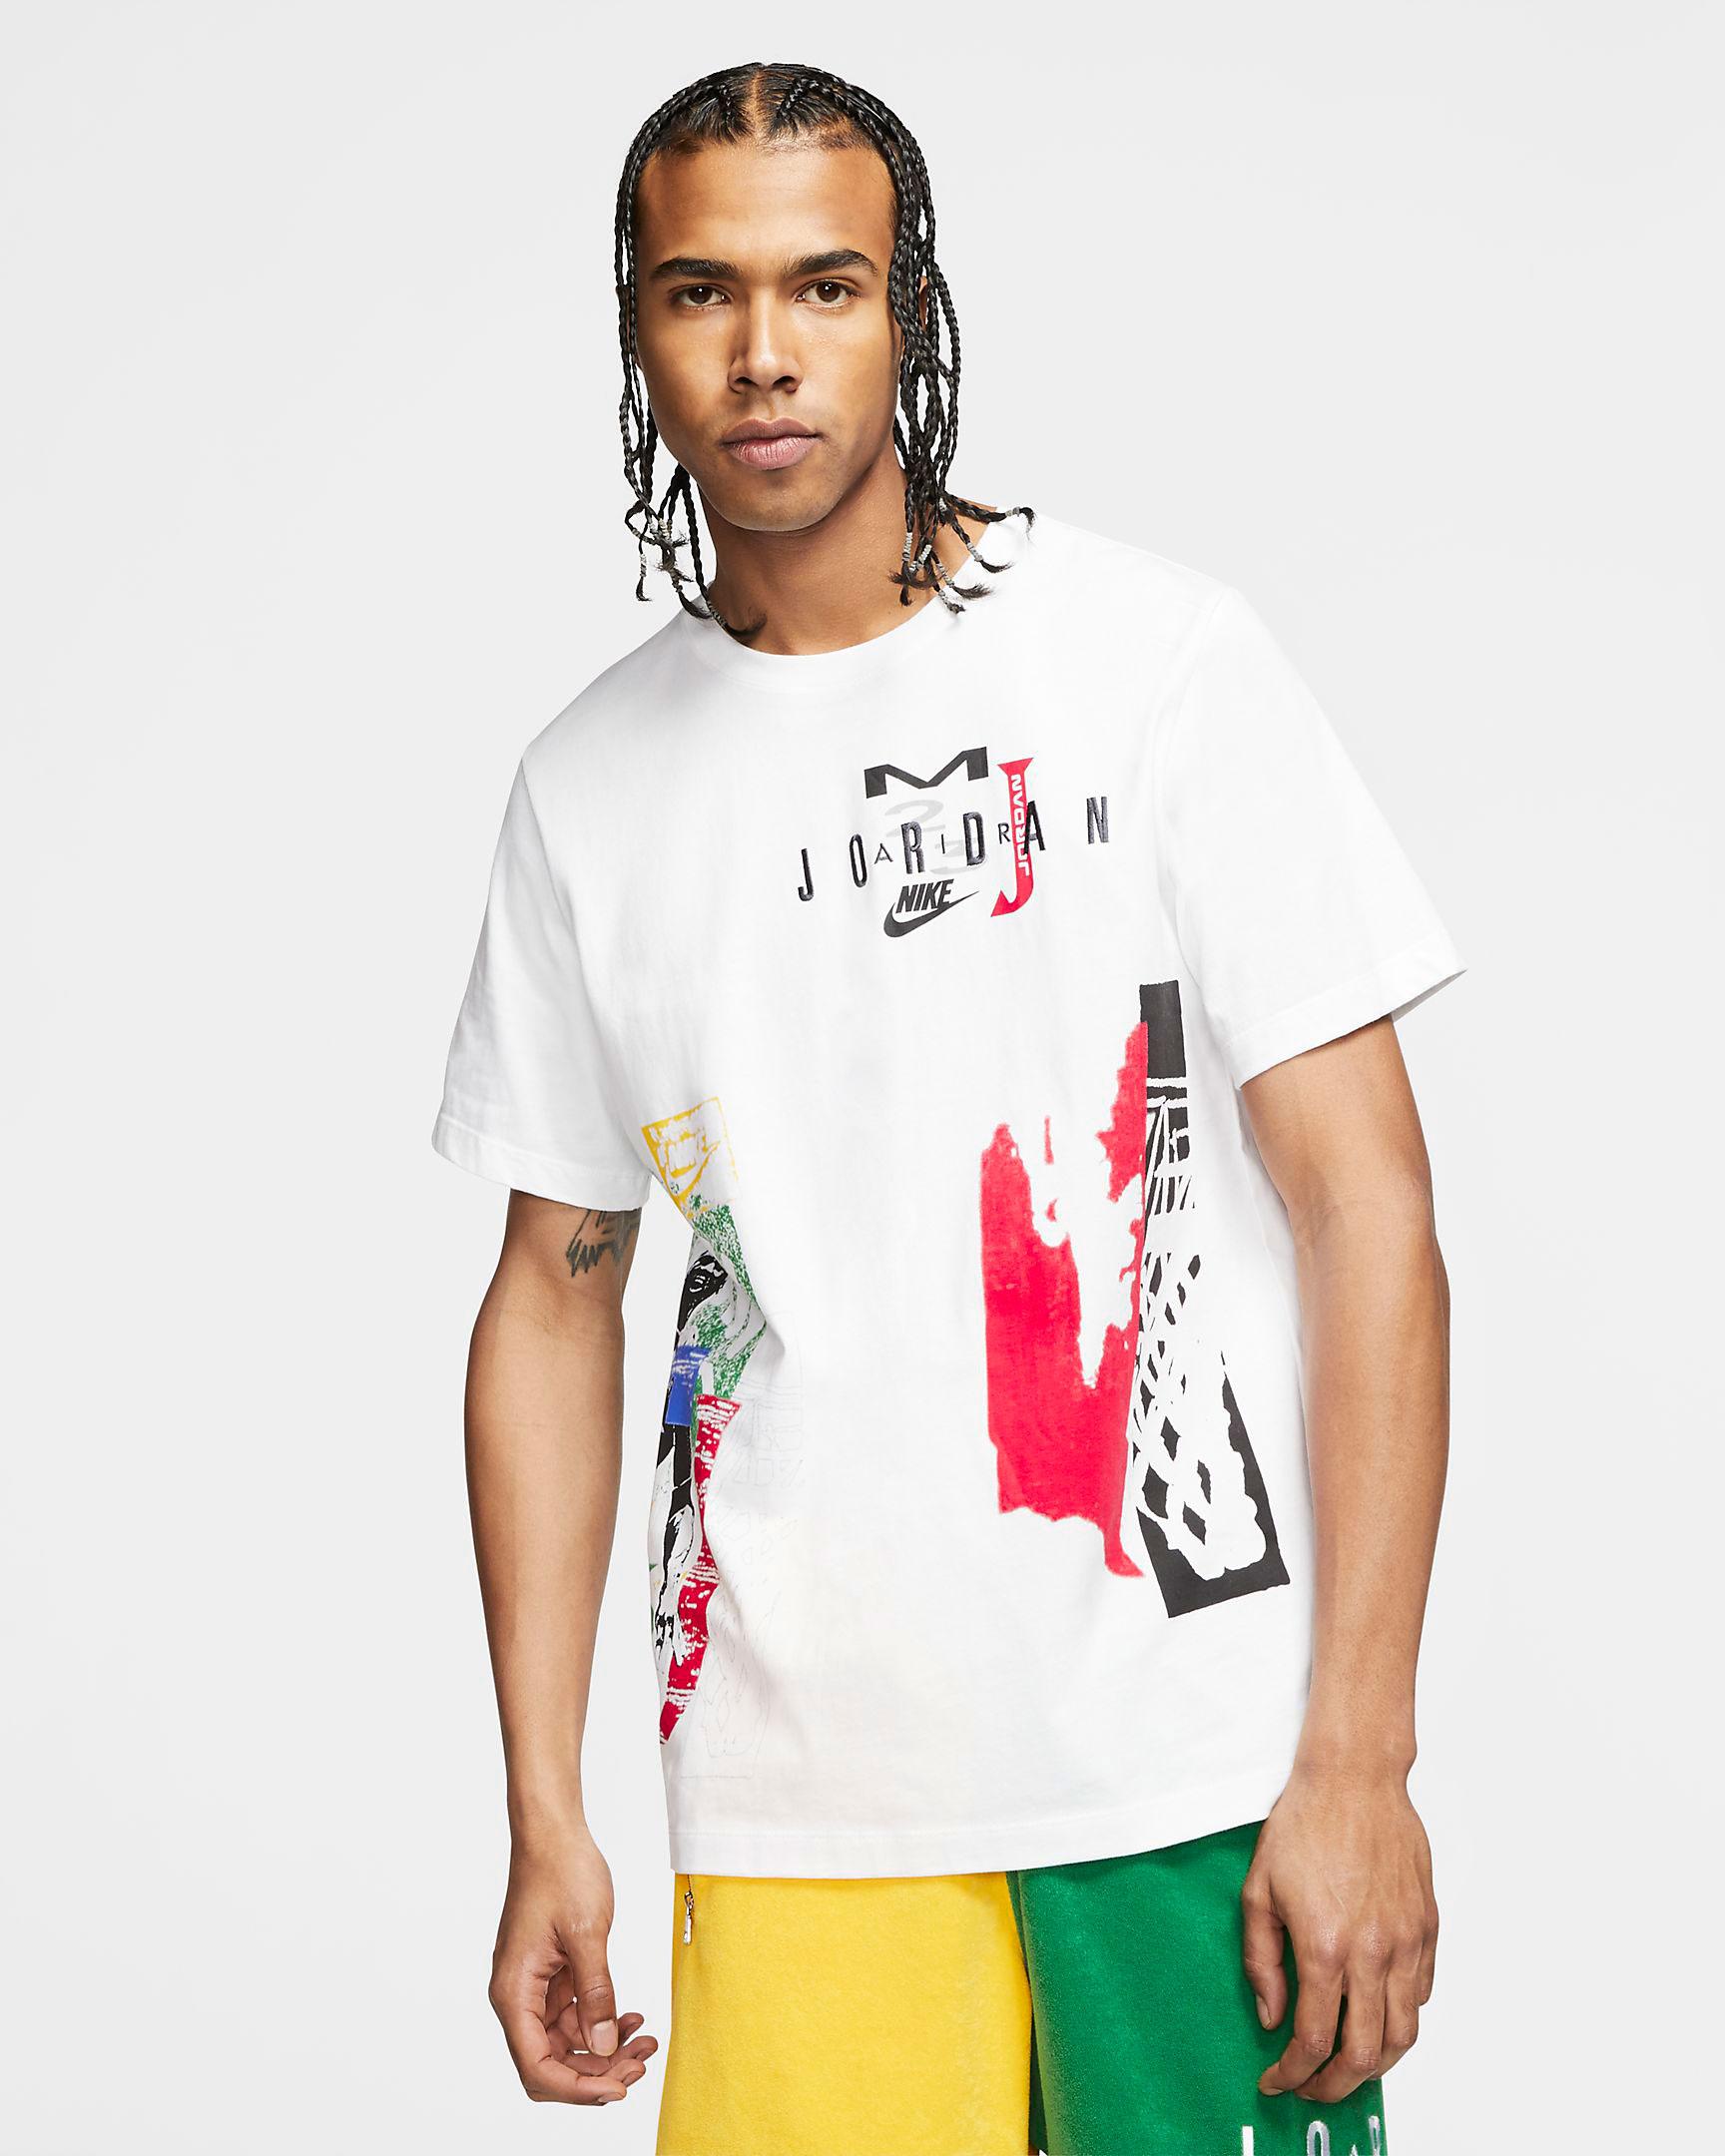 hare-jordan-6-shirt-match-1